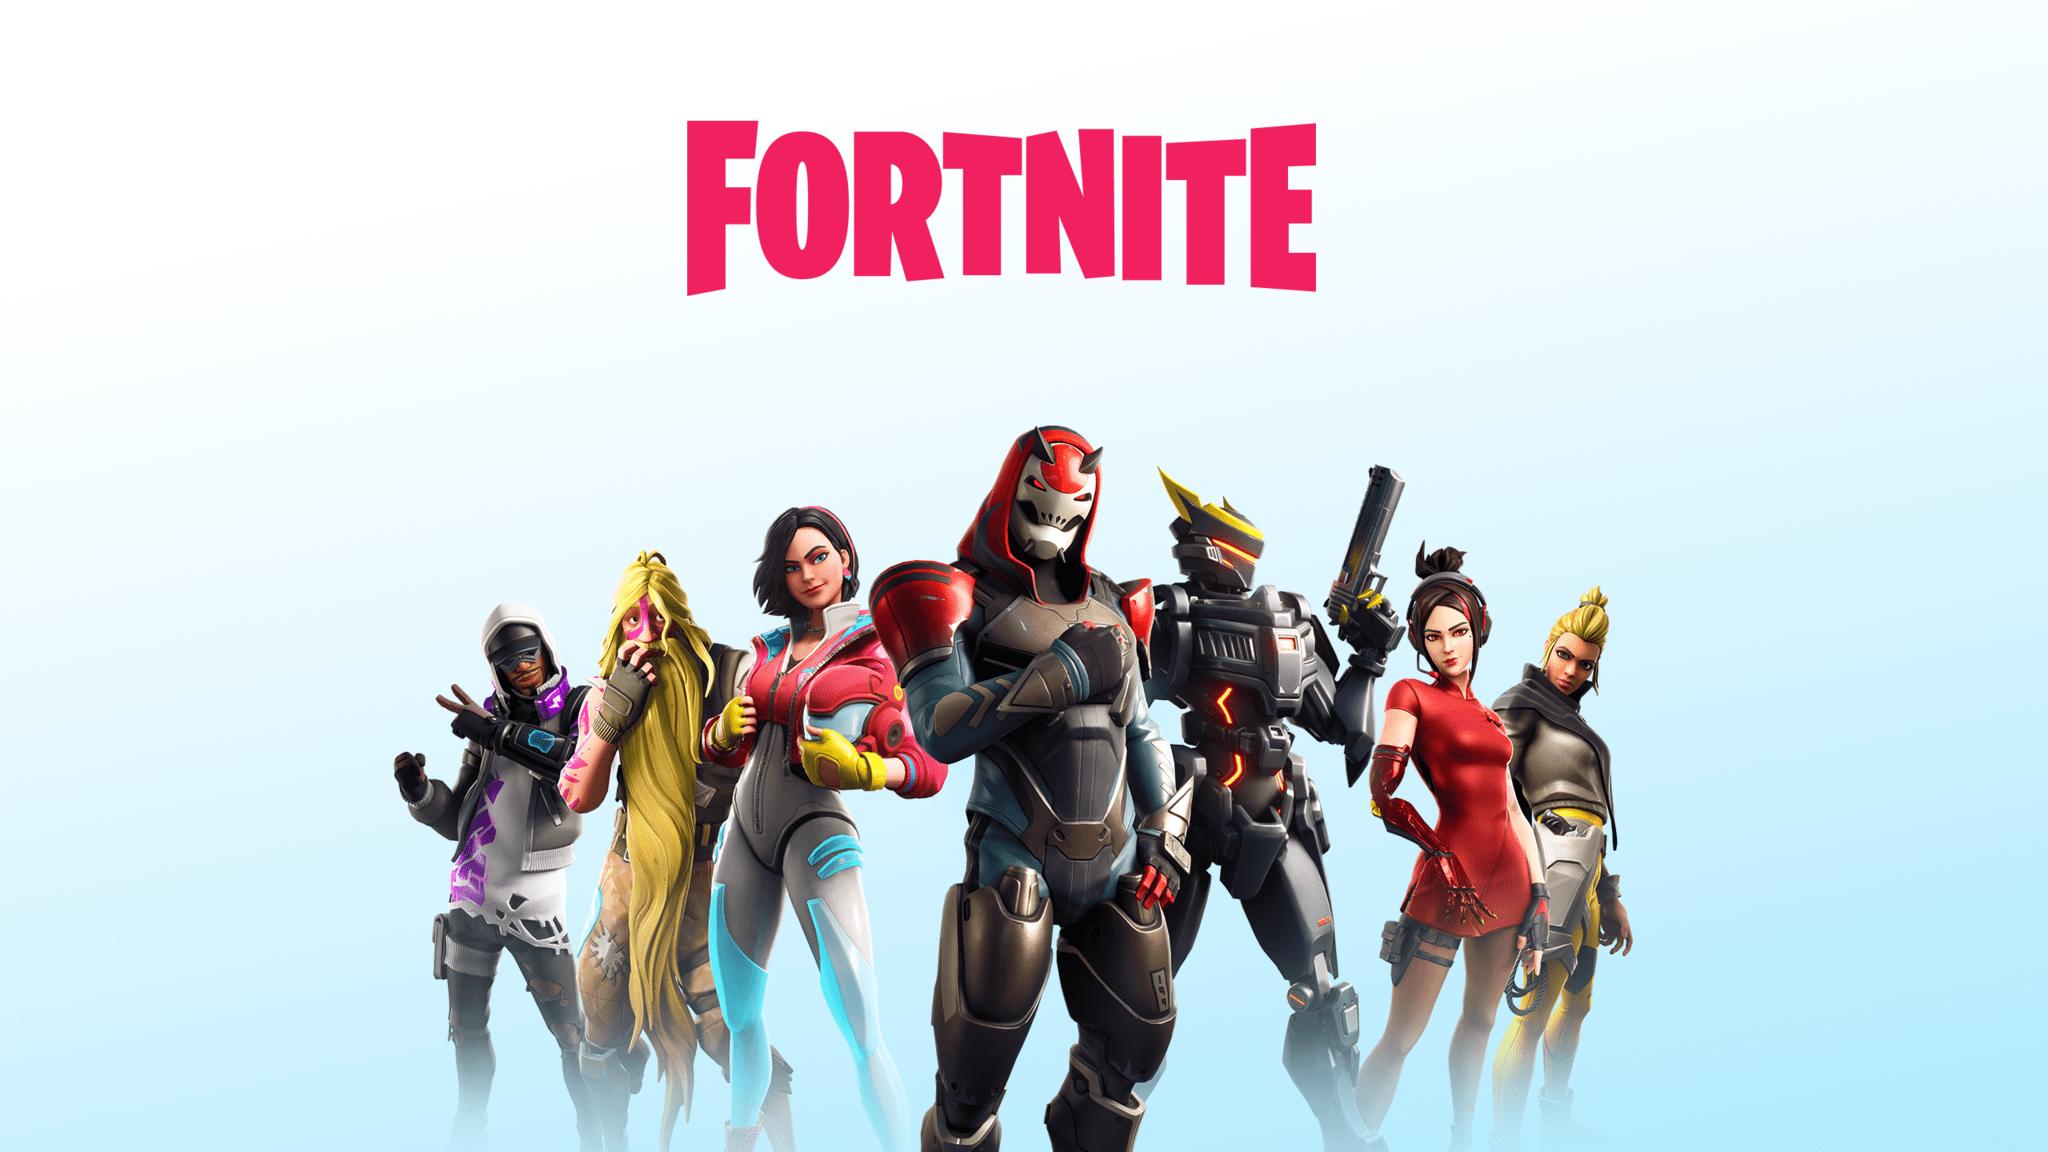 Fortnite Season 9 Wallpapers Top Free Fortnite Season 9